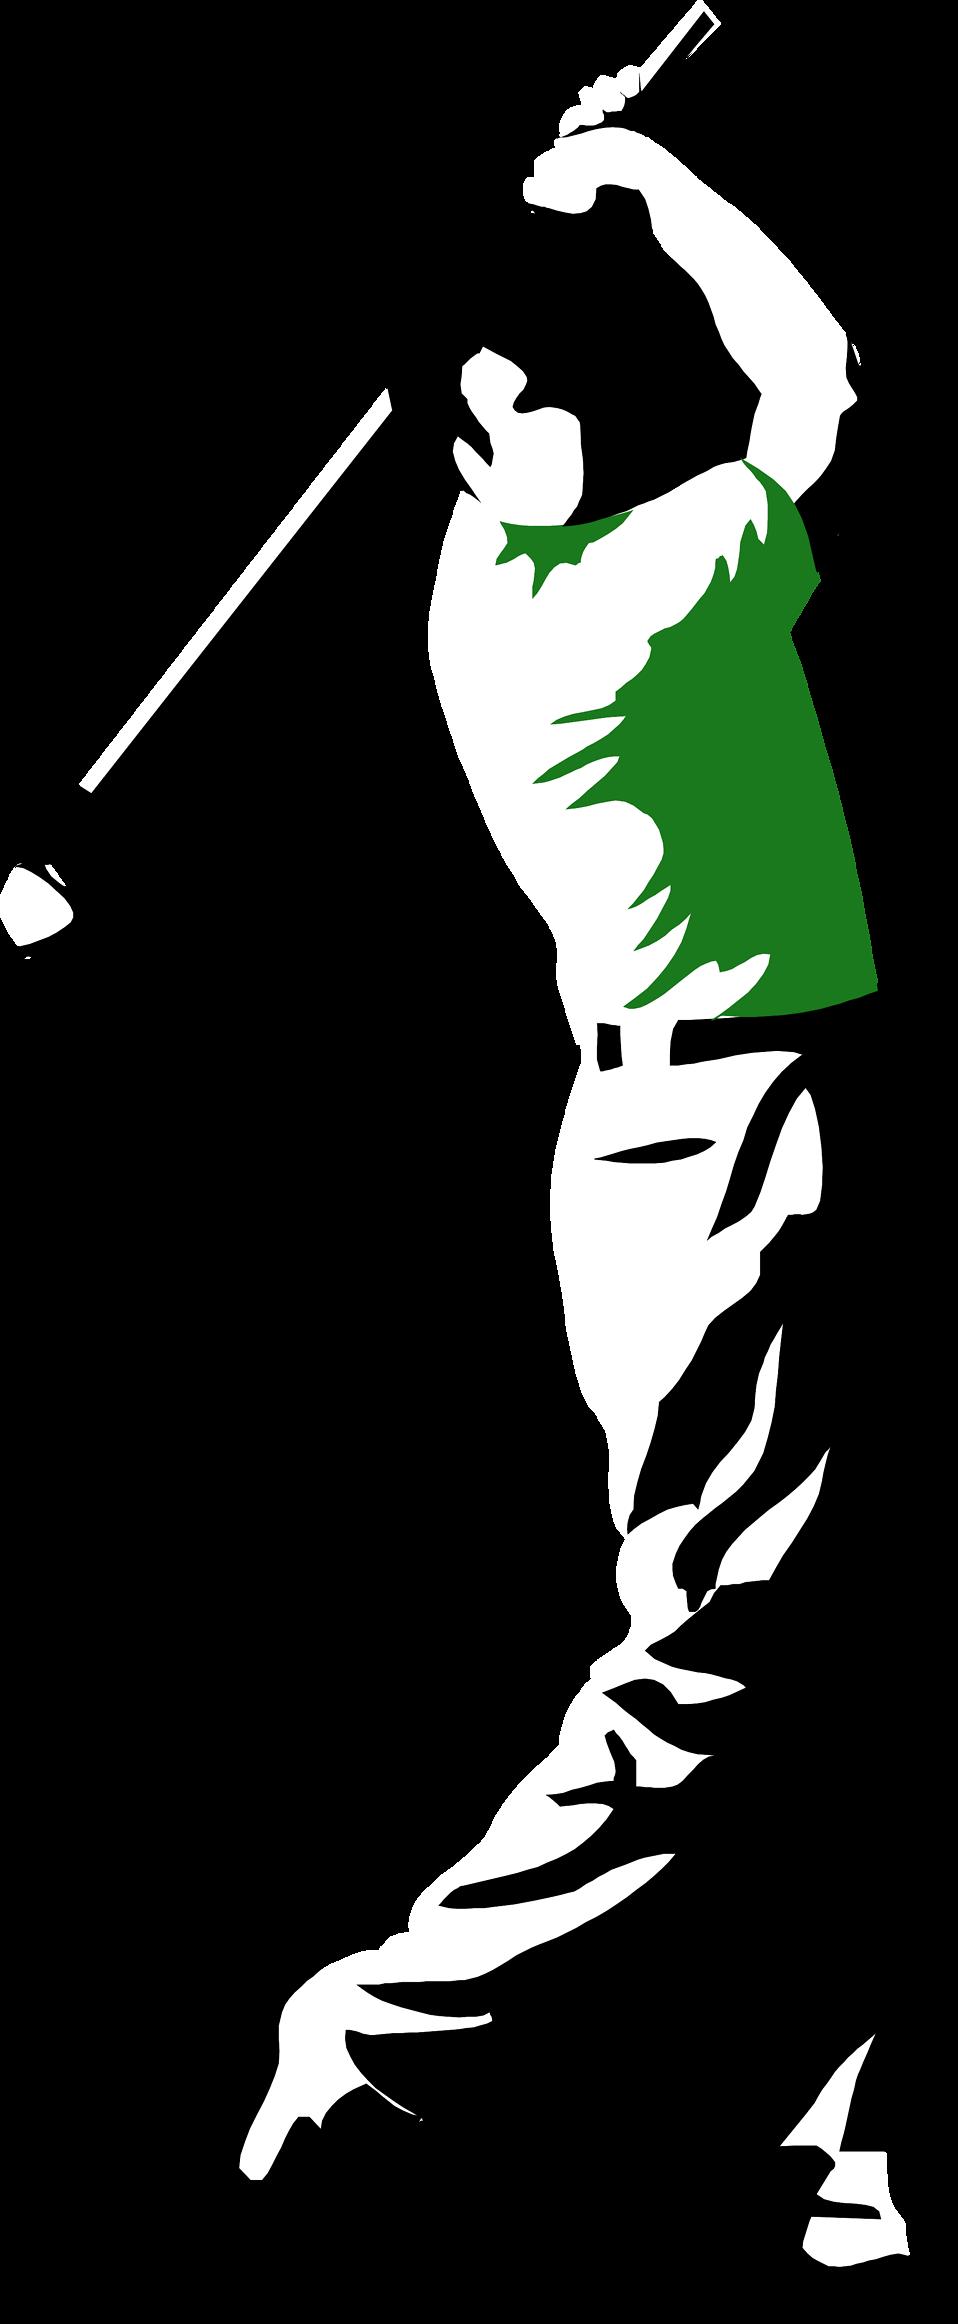 Golf clipart golf scottish. Golfs psychological is important